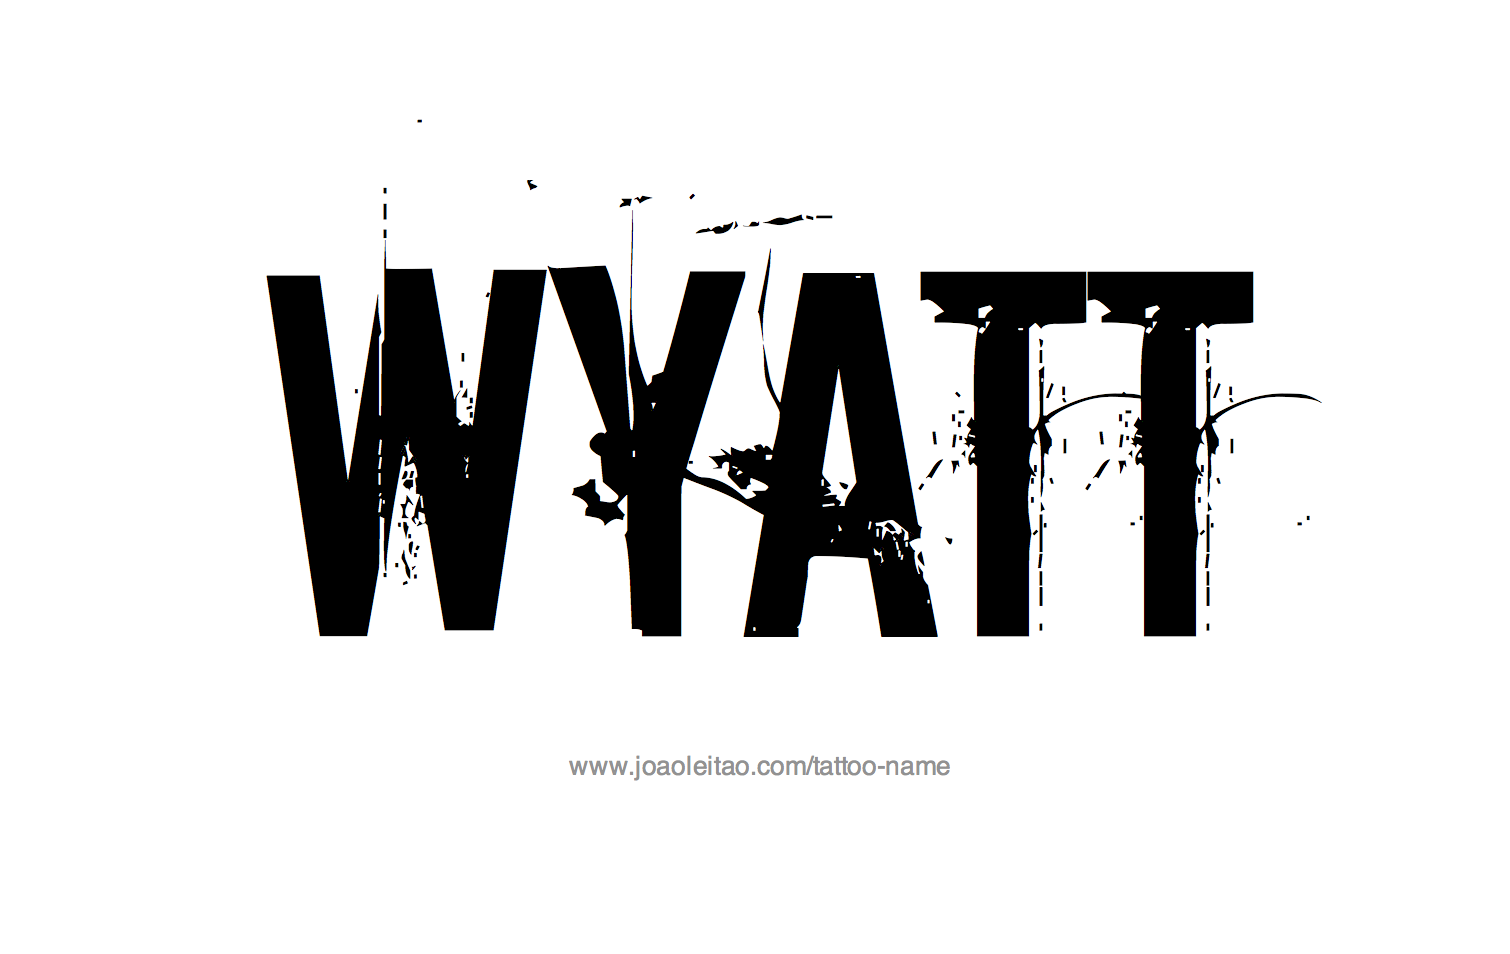 tattoo-design-male-name-wyatt%20(4).png